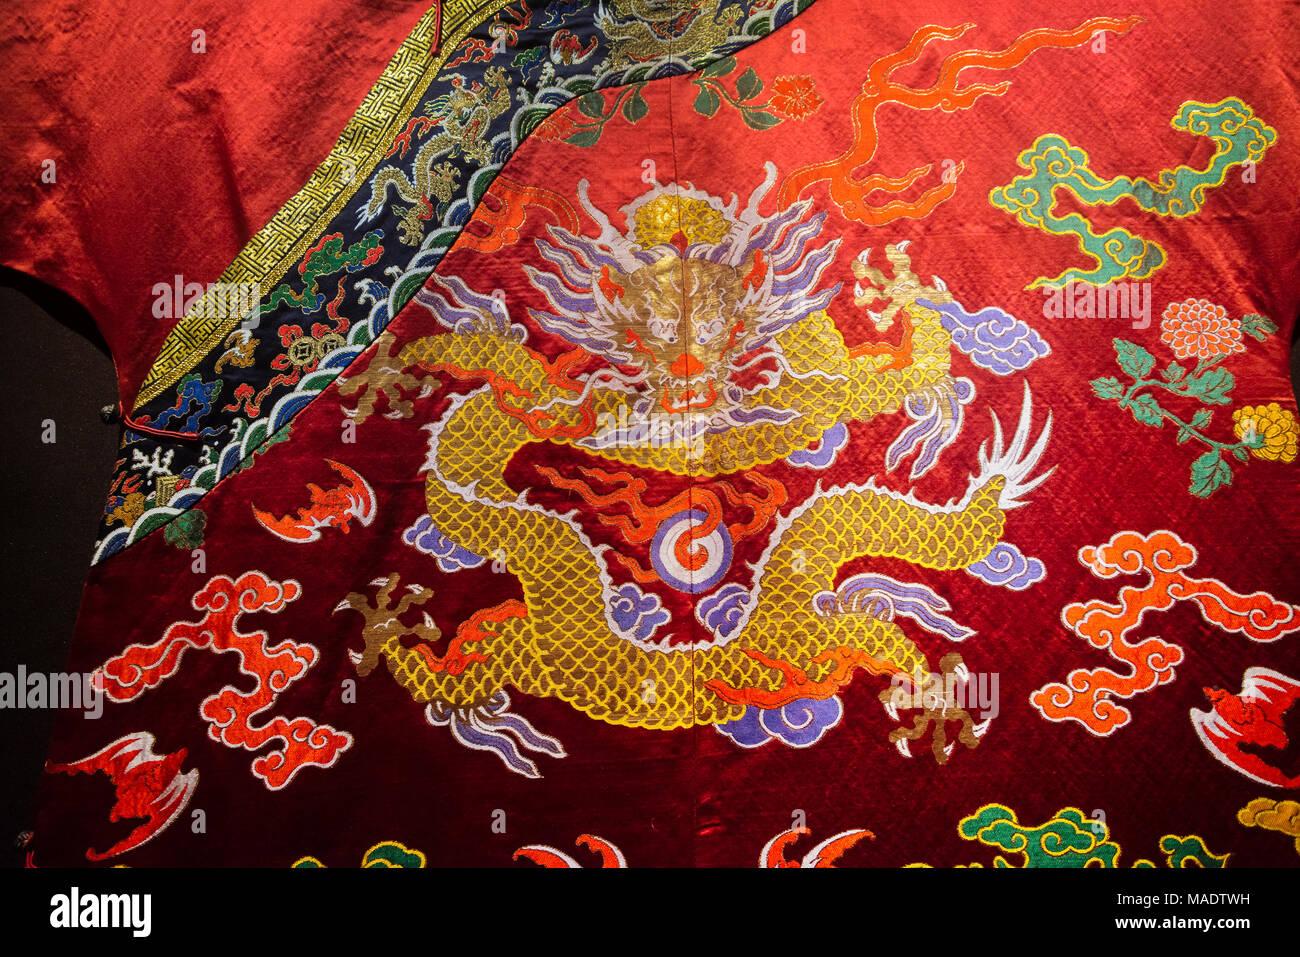 Imperial Robe auf Anzeige im Präsidentenpalast, Nanjing, Provinz Jiangsu, China Stockbild